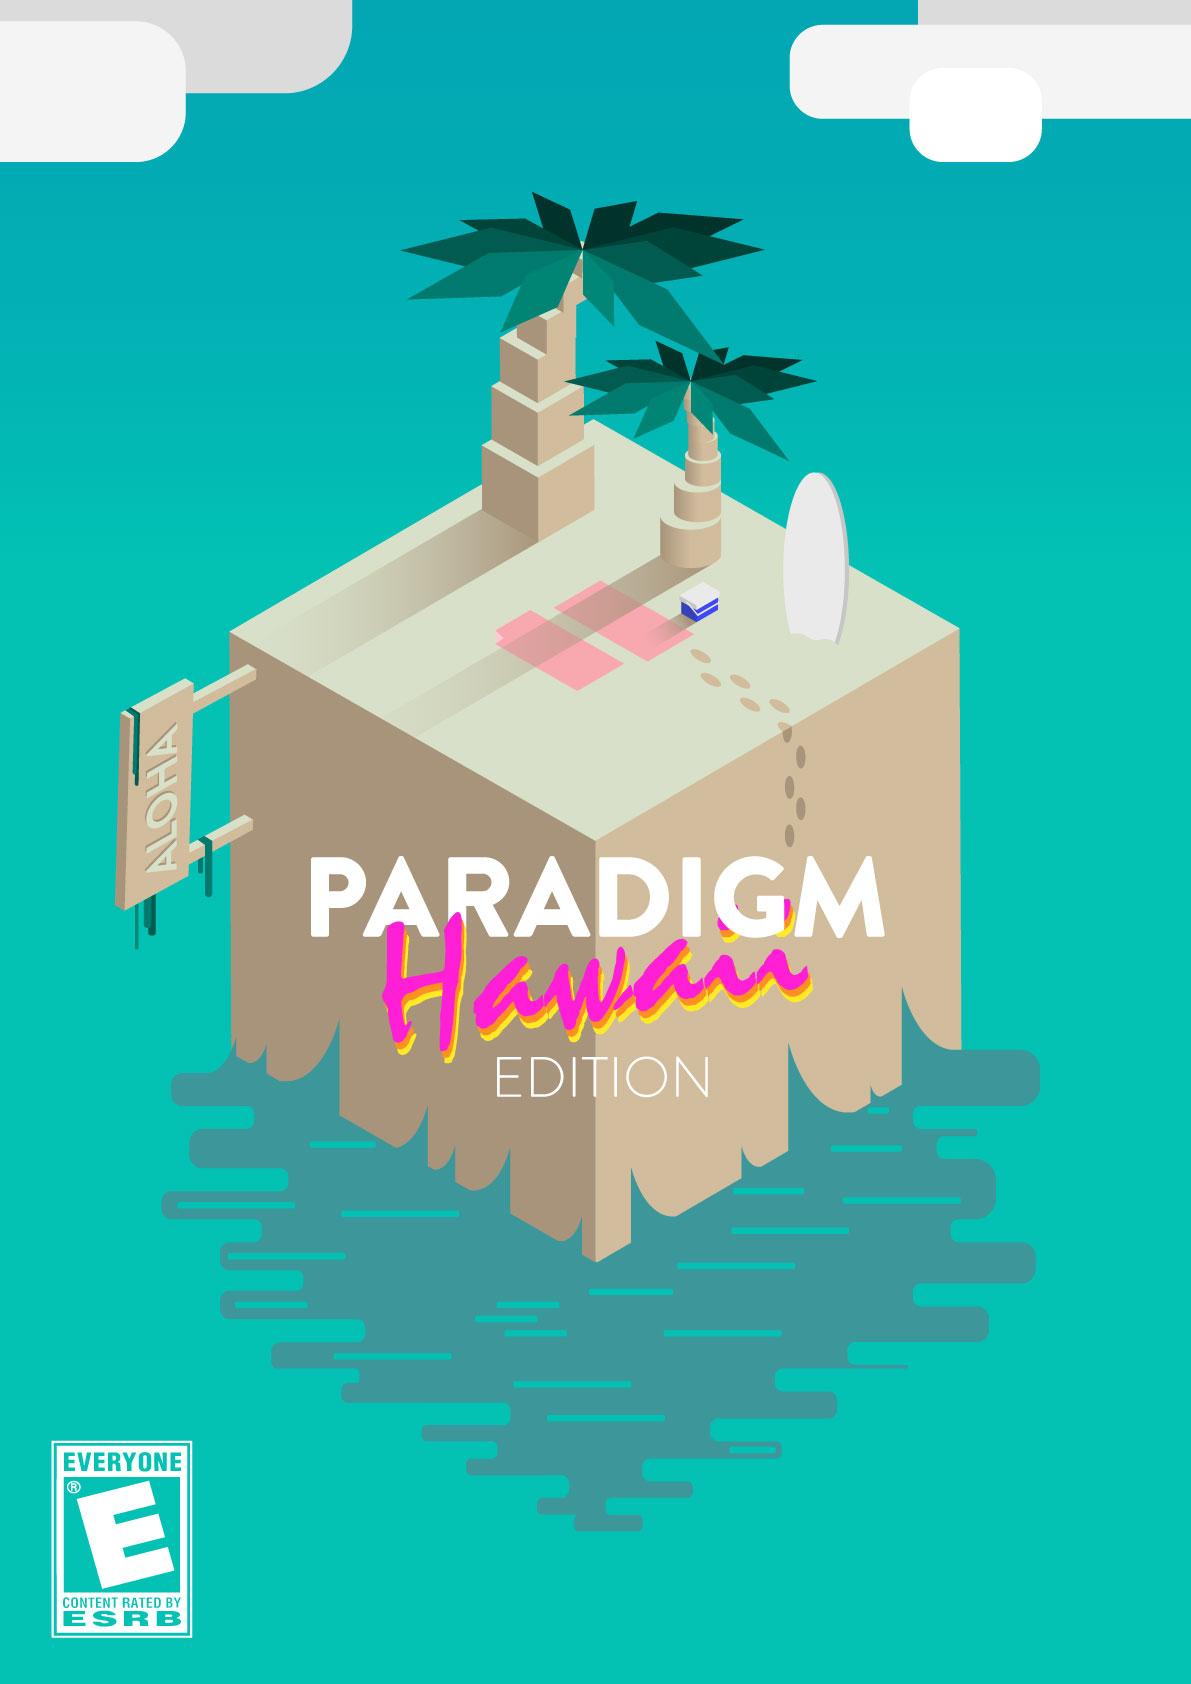 Paradigm-.jpg